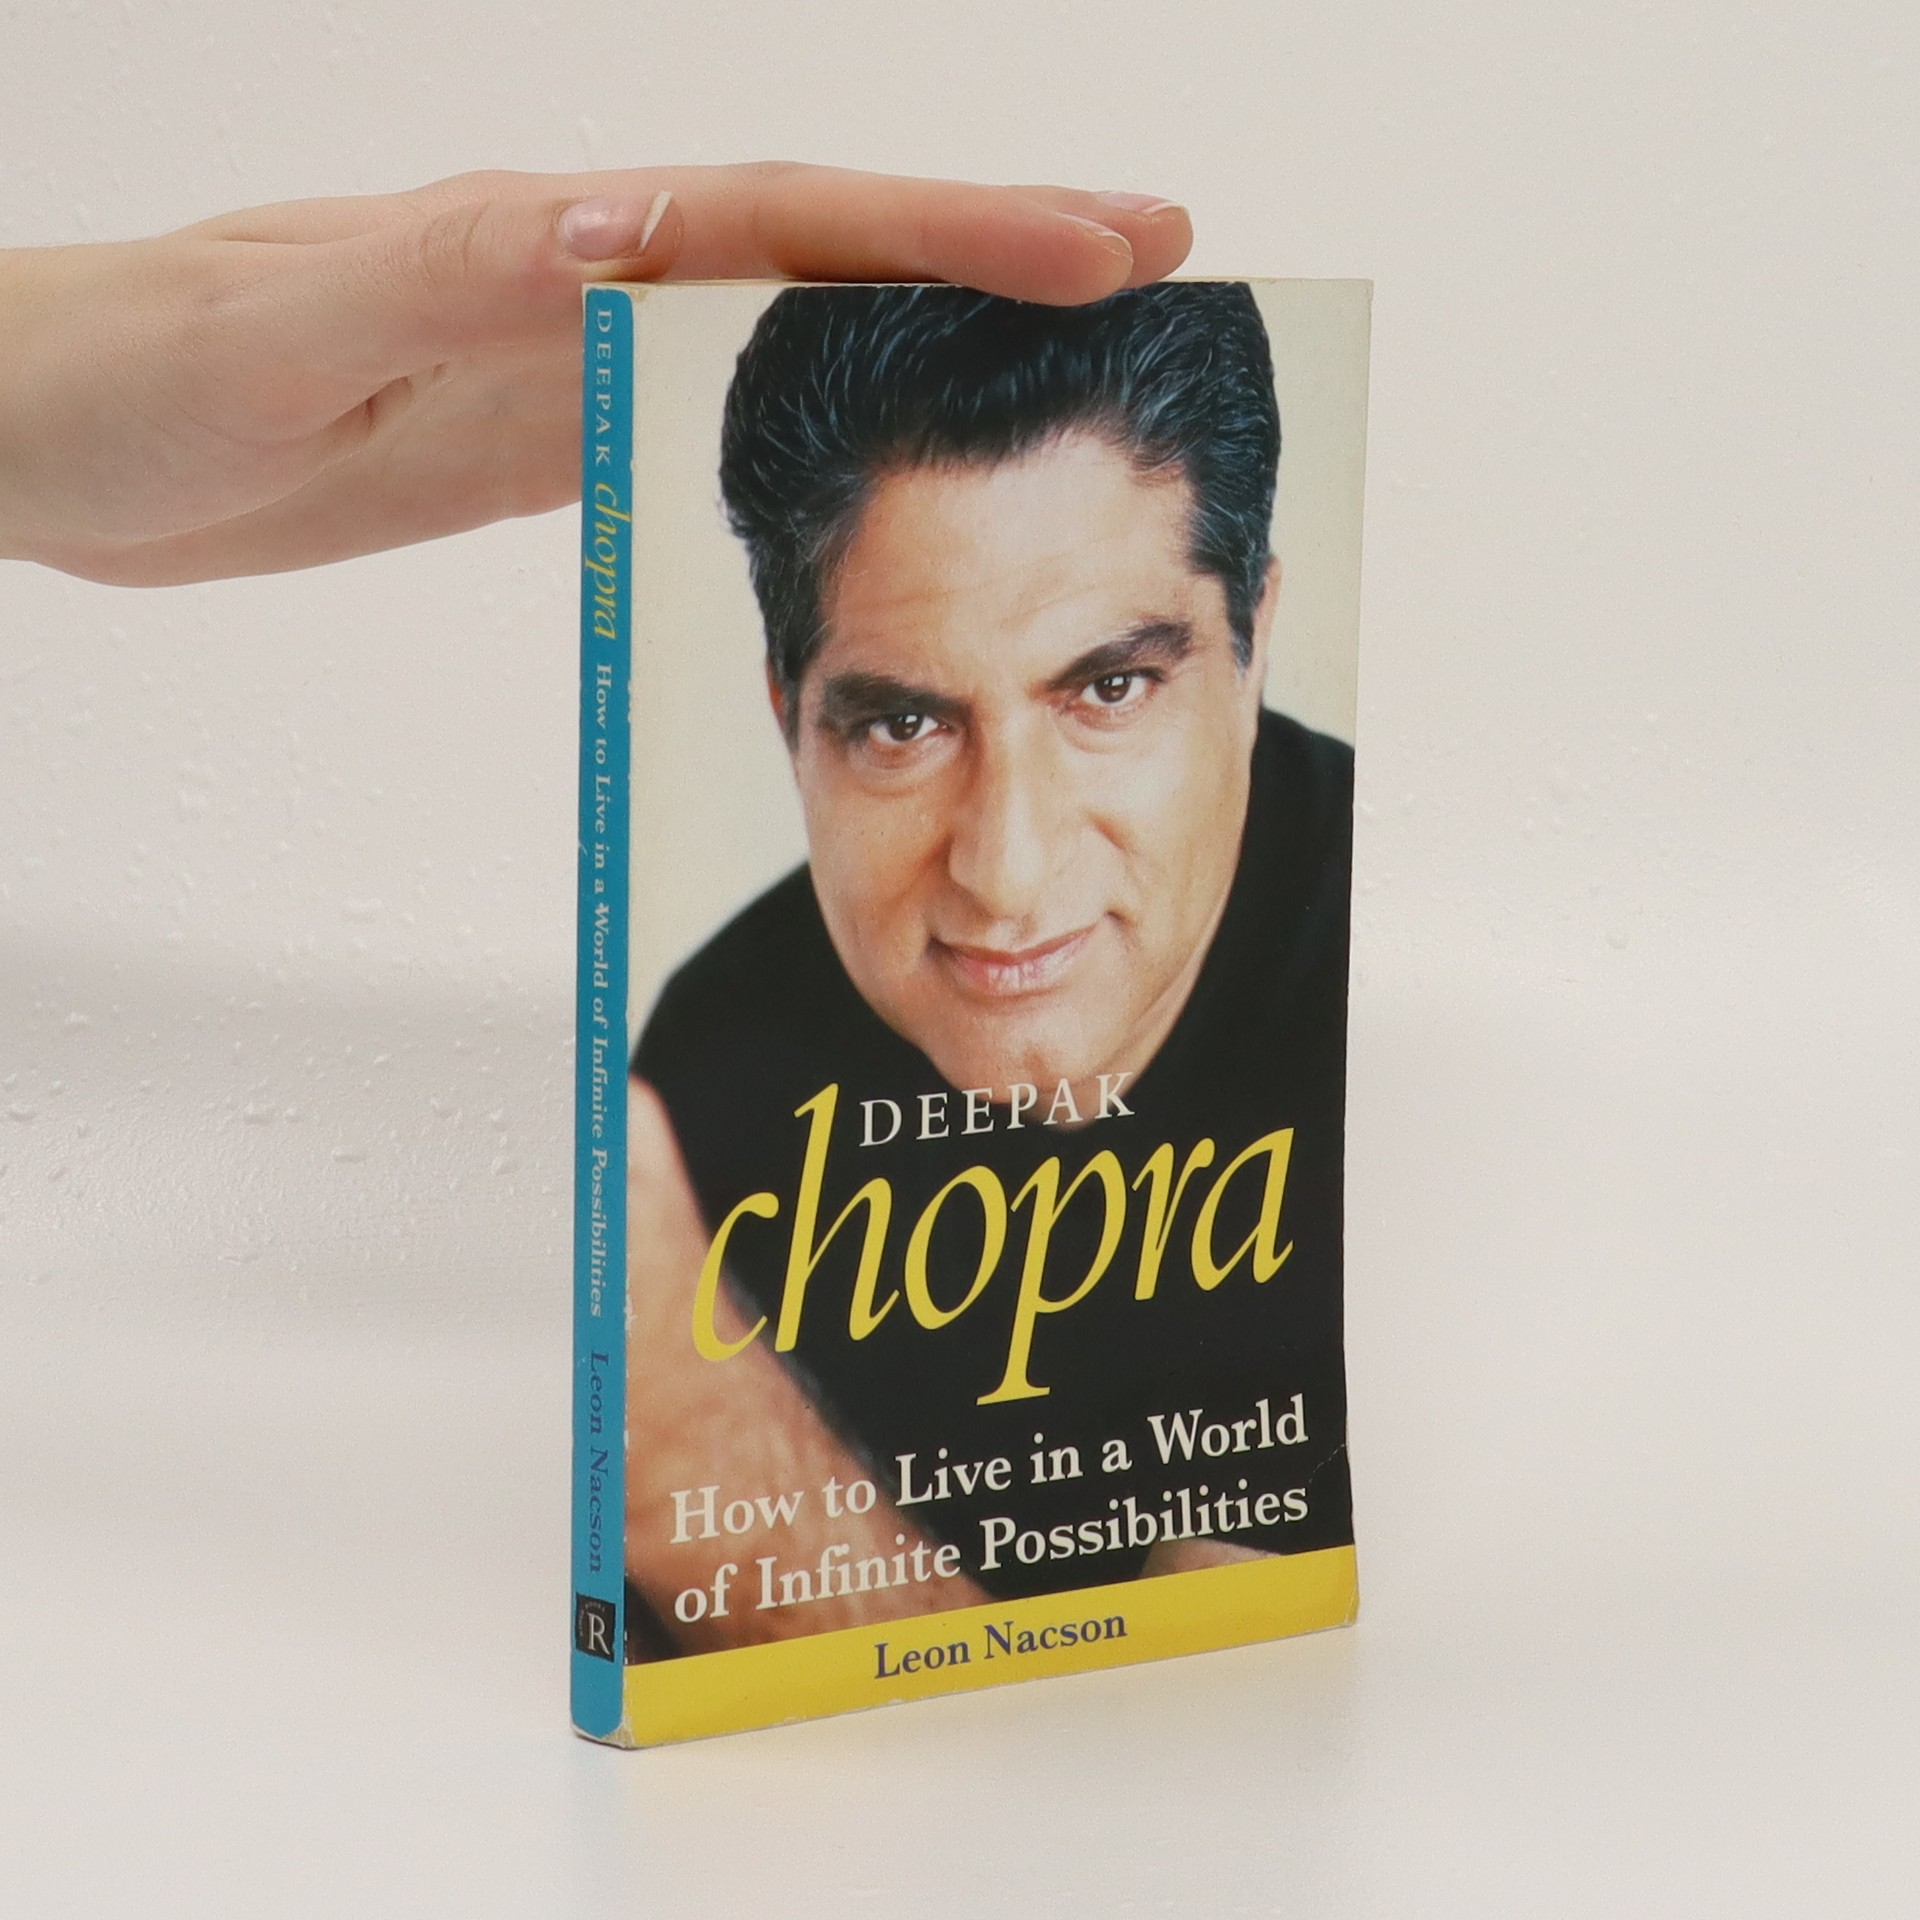 antikvární kniha Deepak Chopra : how to live in a world of infinite possibilities, 1998